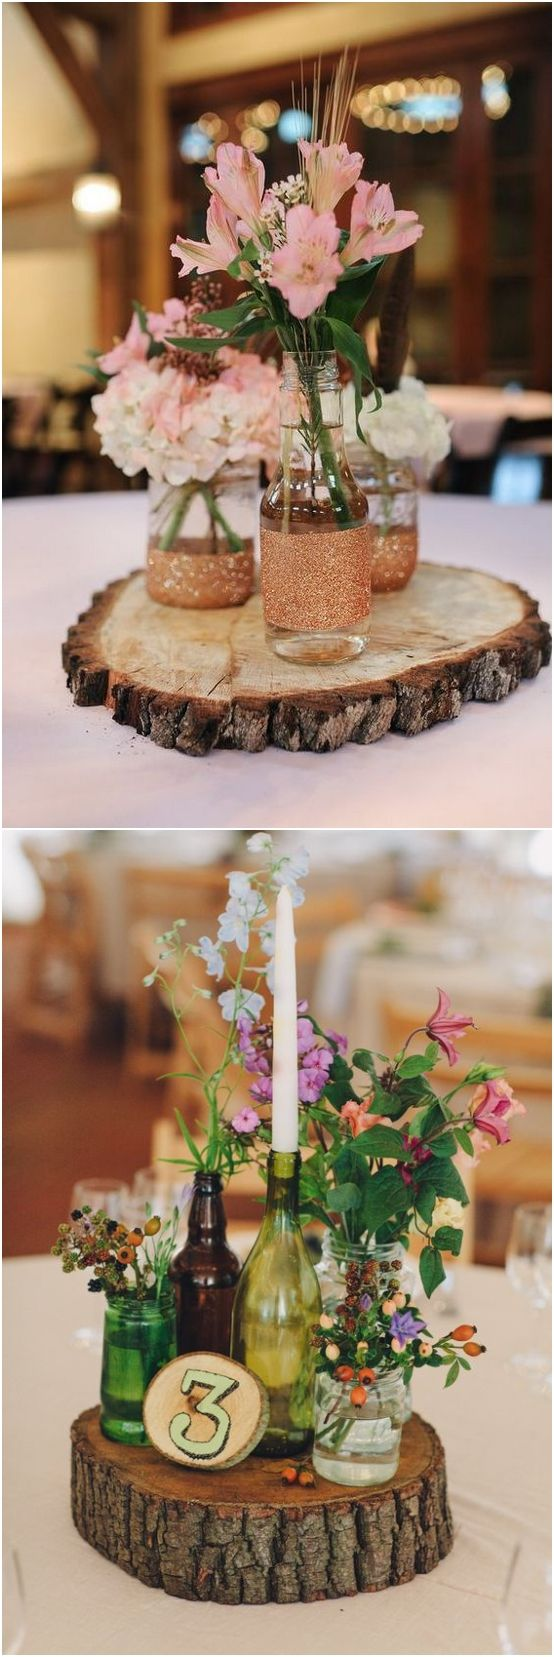 Rustic Woodsy Wedding Trend 2018 Tree Stump Pinterest Woodsy